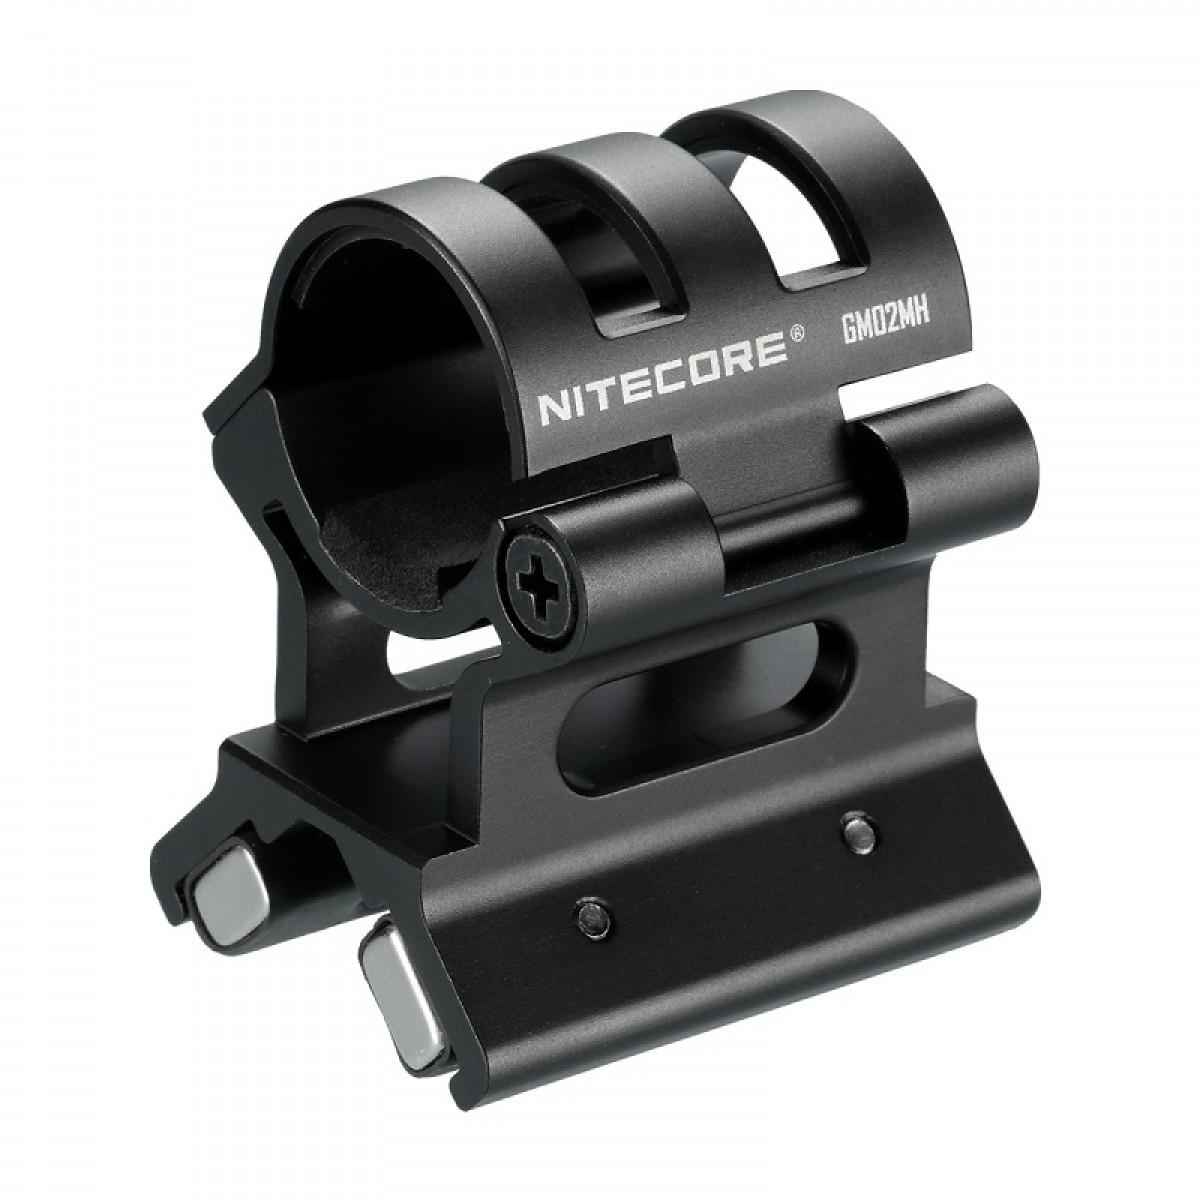 Nitecore GM02MH Magnetic Barrel Gun Mount for Flashlight